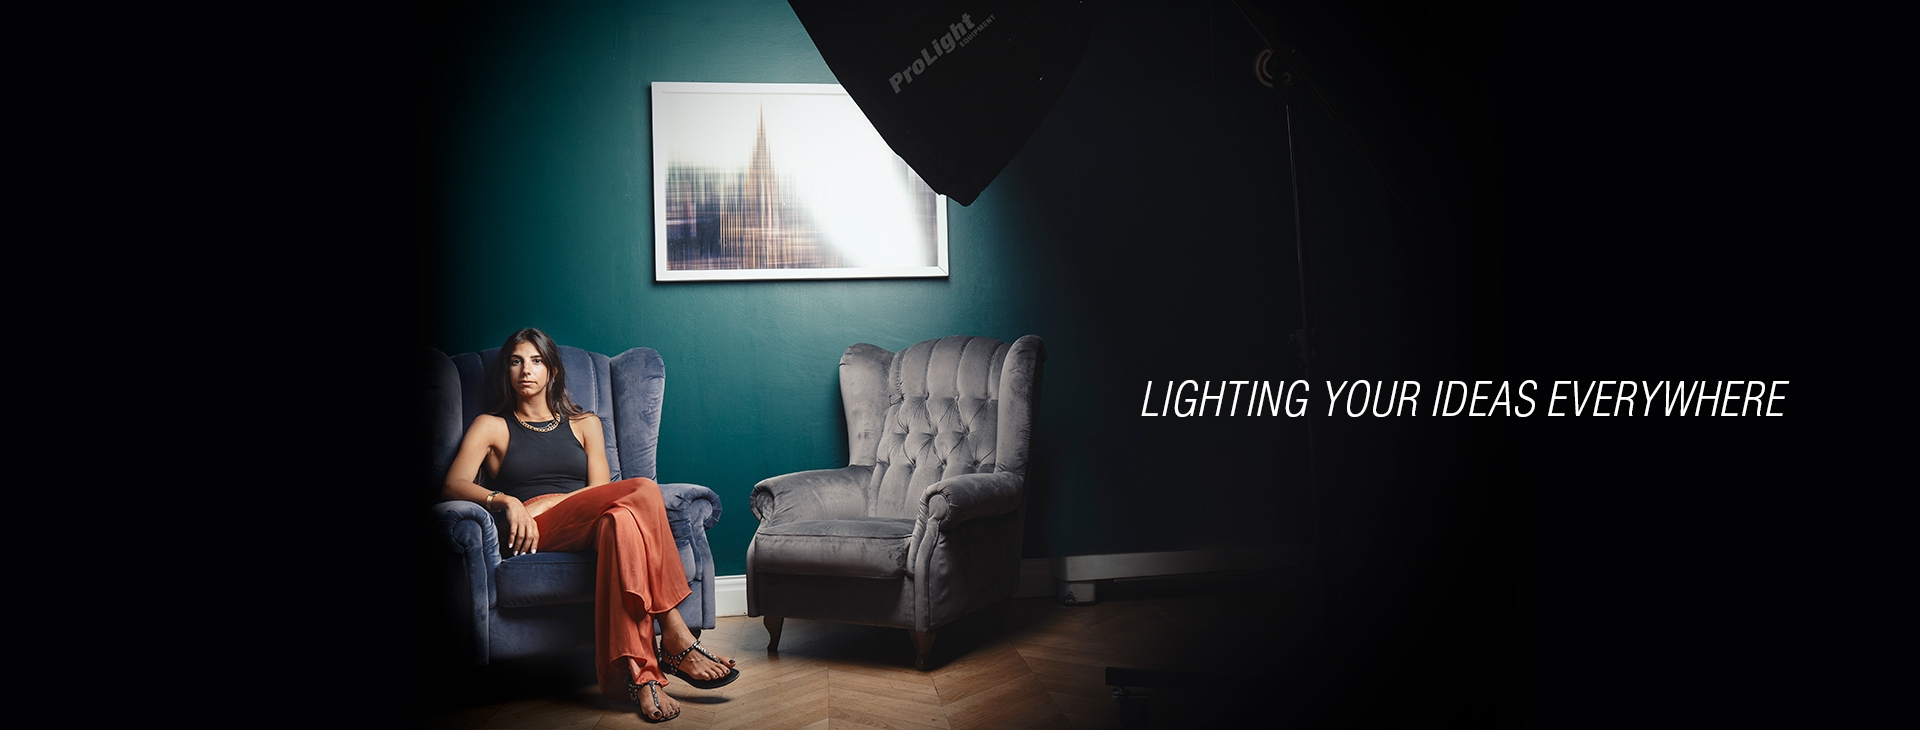 LIGHTING YOUR IDEAS EVERYWHERE